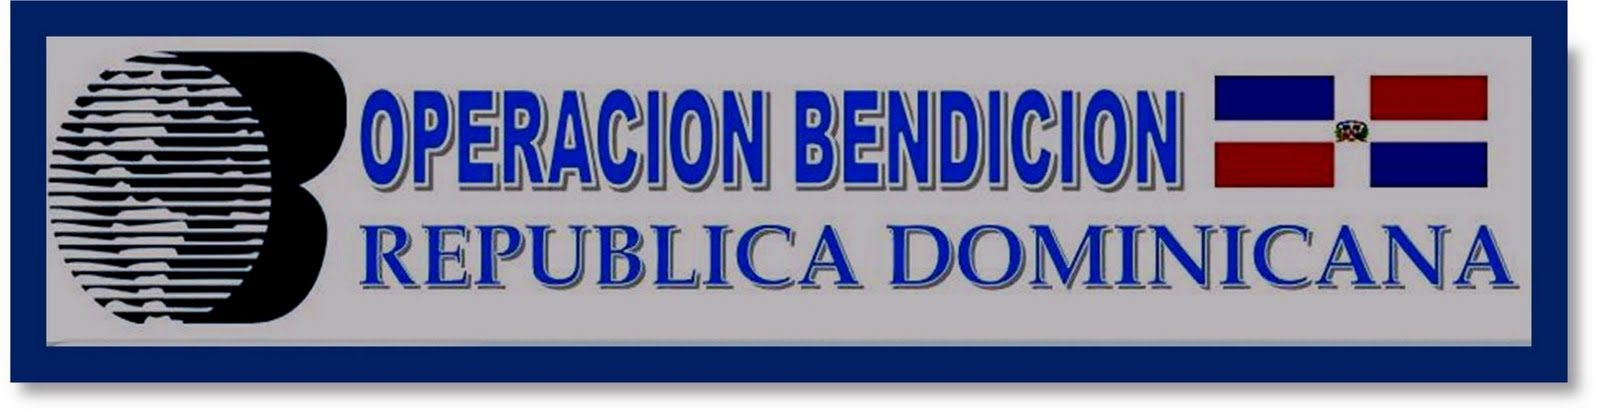 OPERACION BENDICION REPUBLICA DOMINICANA